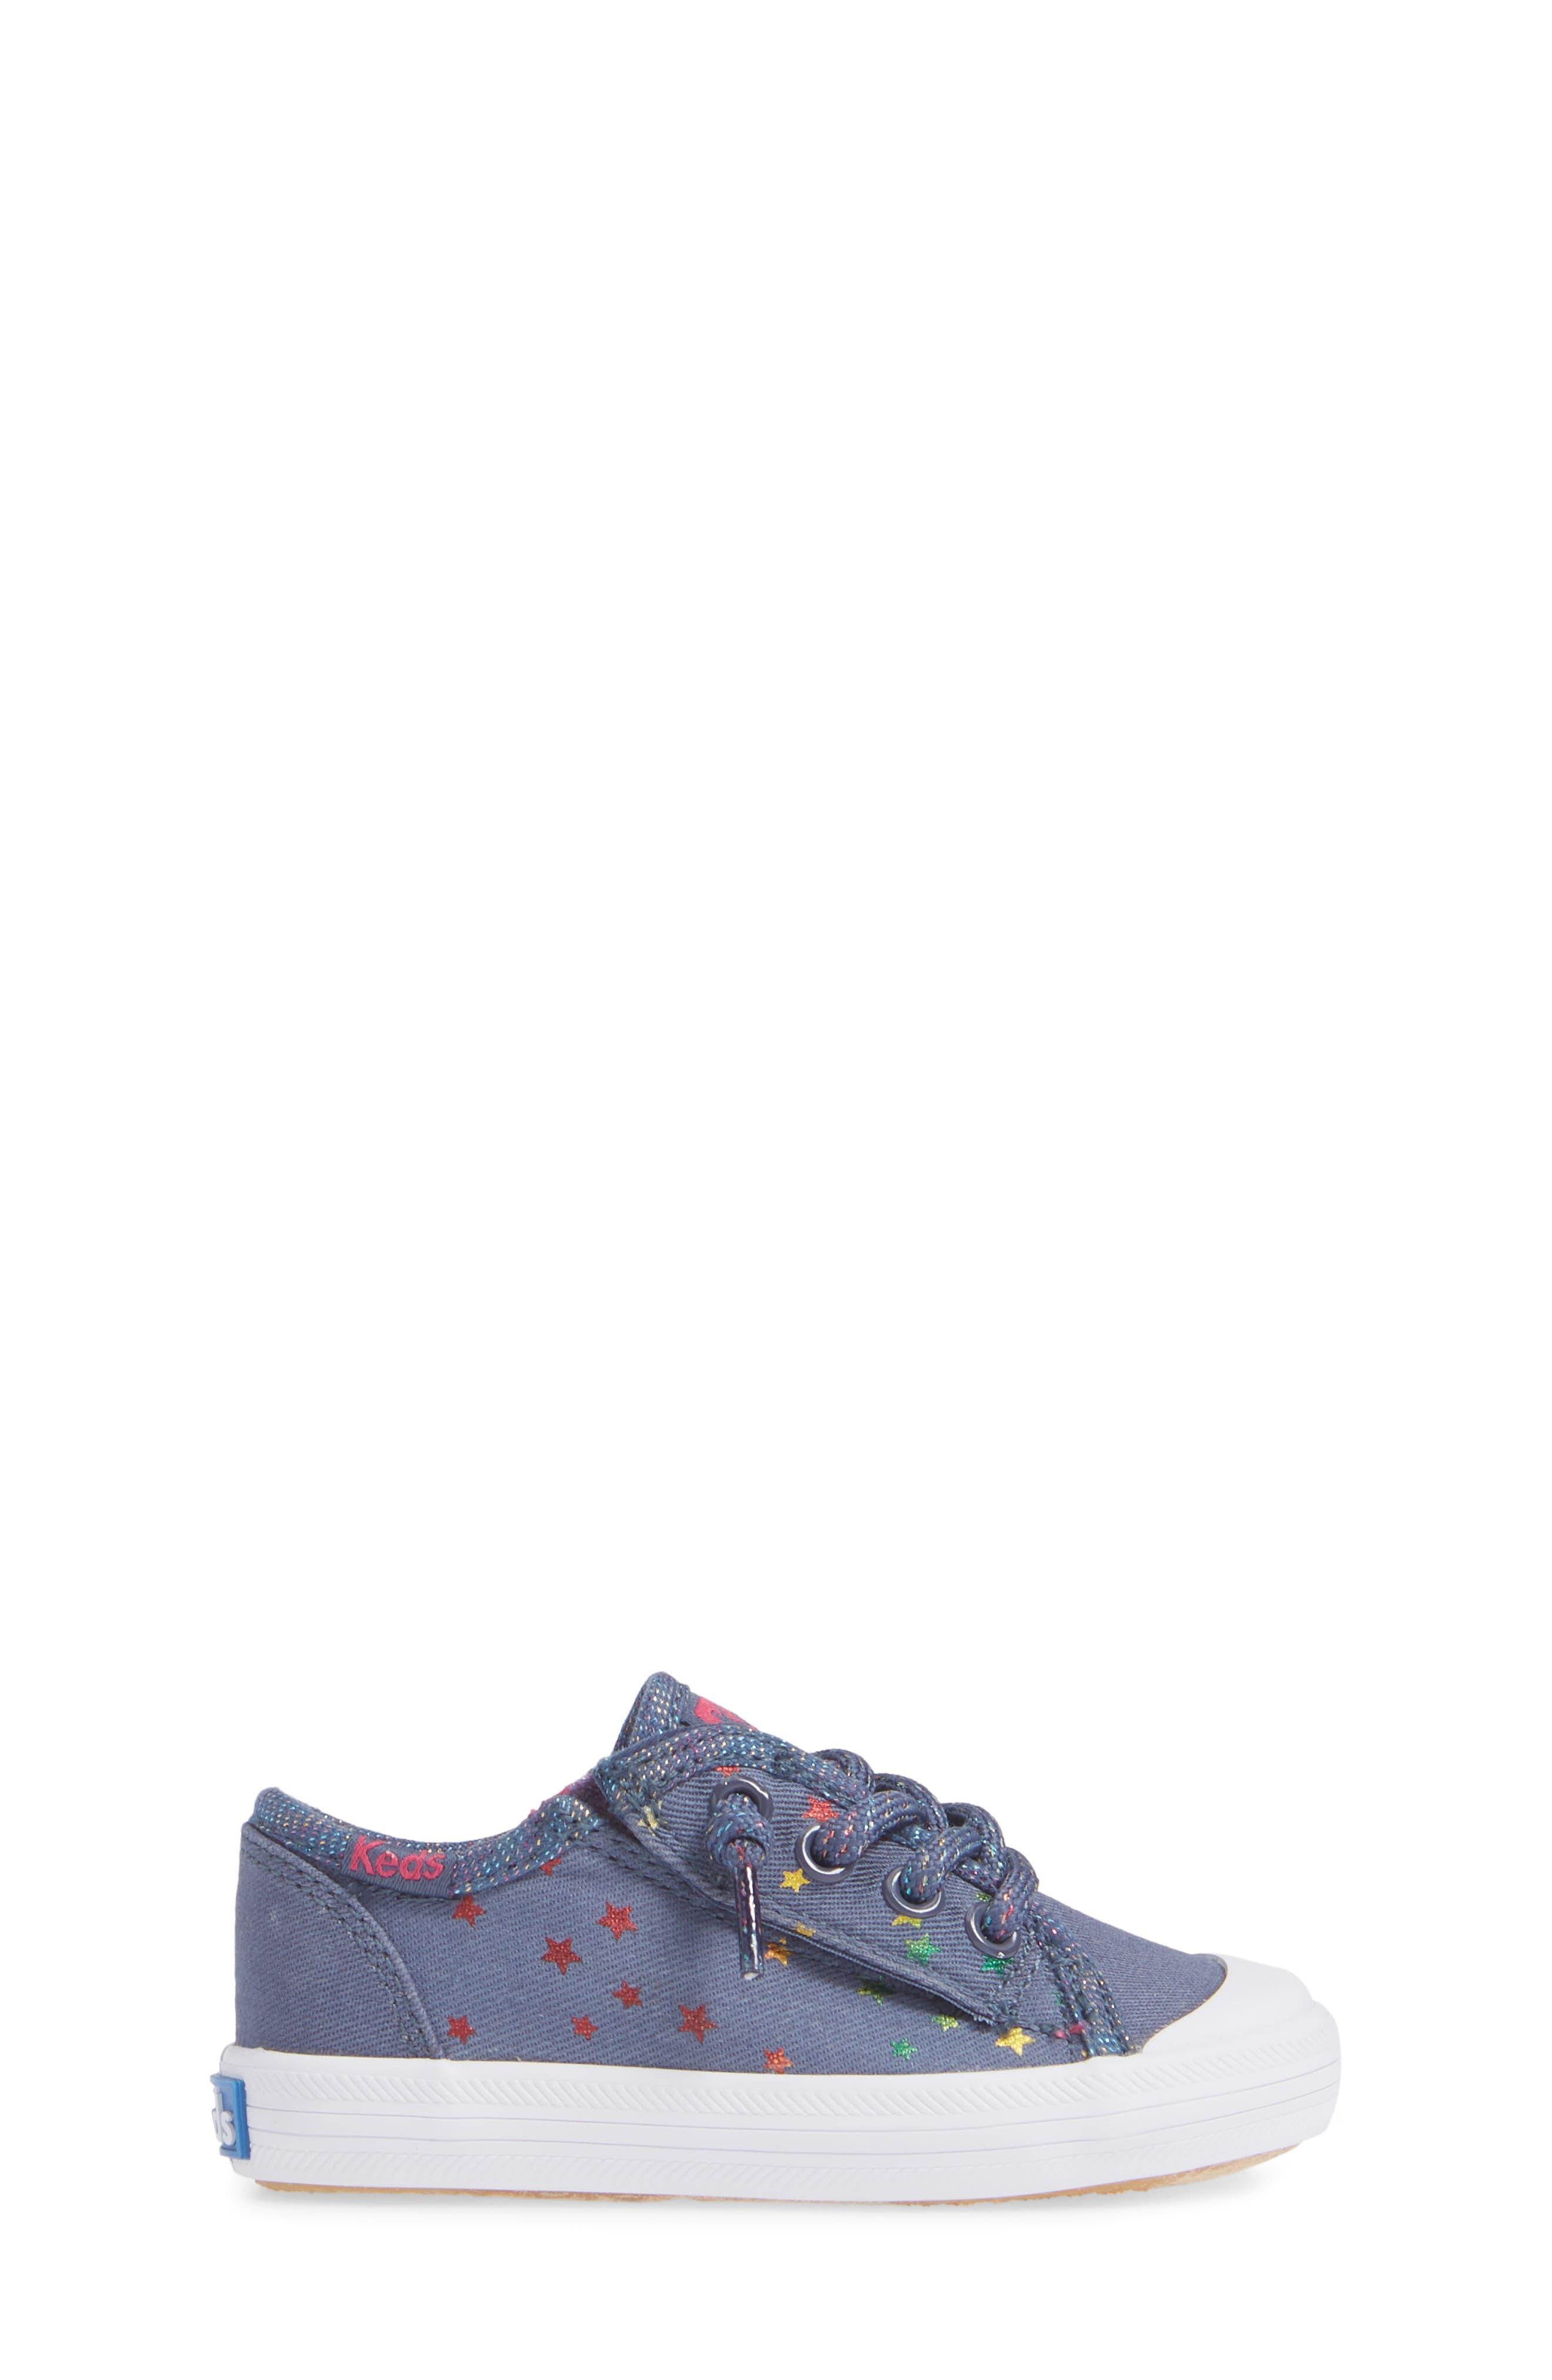 KEDS<SUP>®</SUP>, Kickstart Cap Toe Sneaker, Alternate thumbnail 3, color, STAR PERF